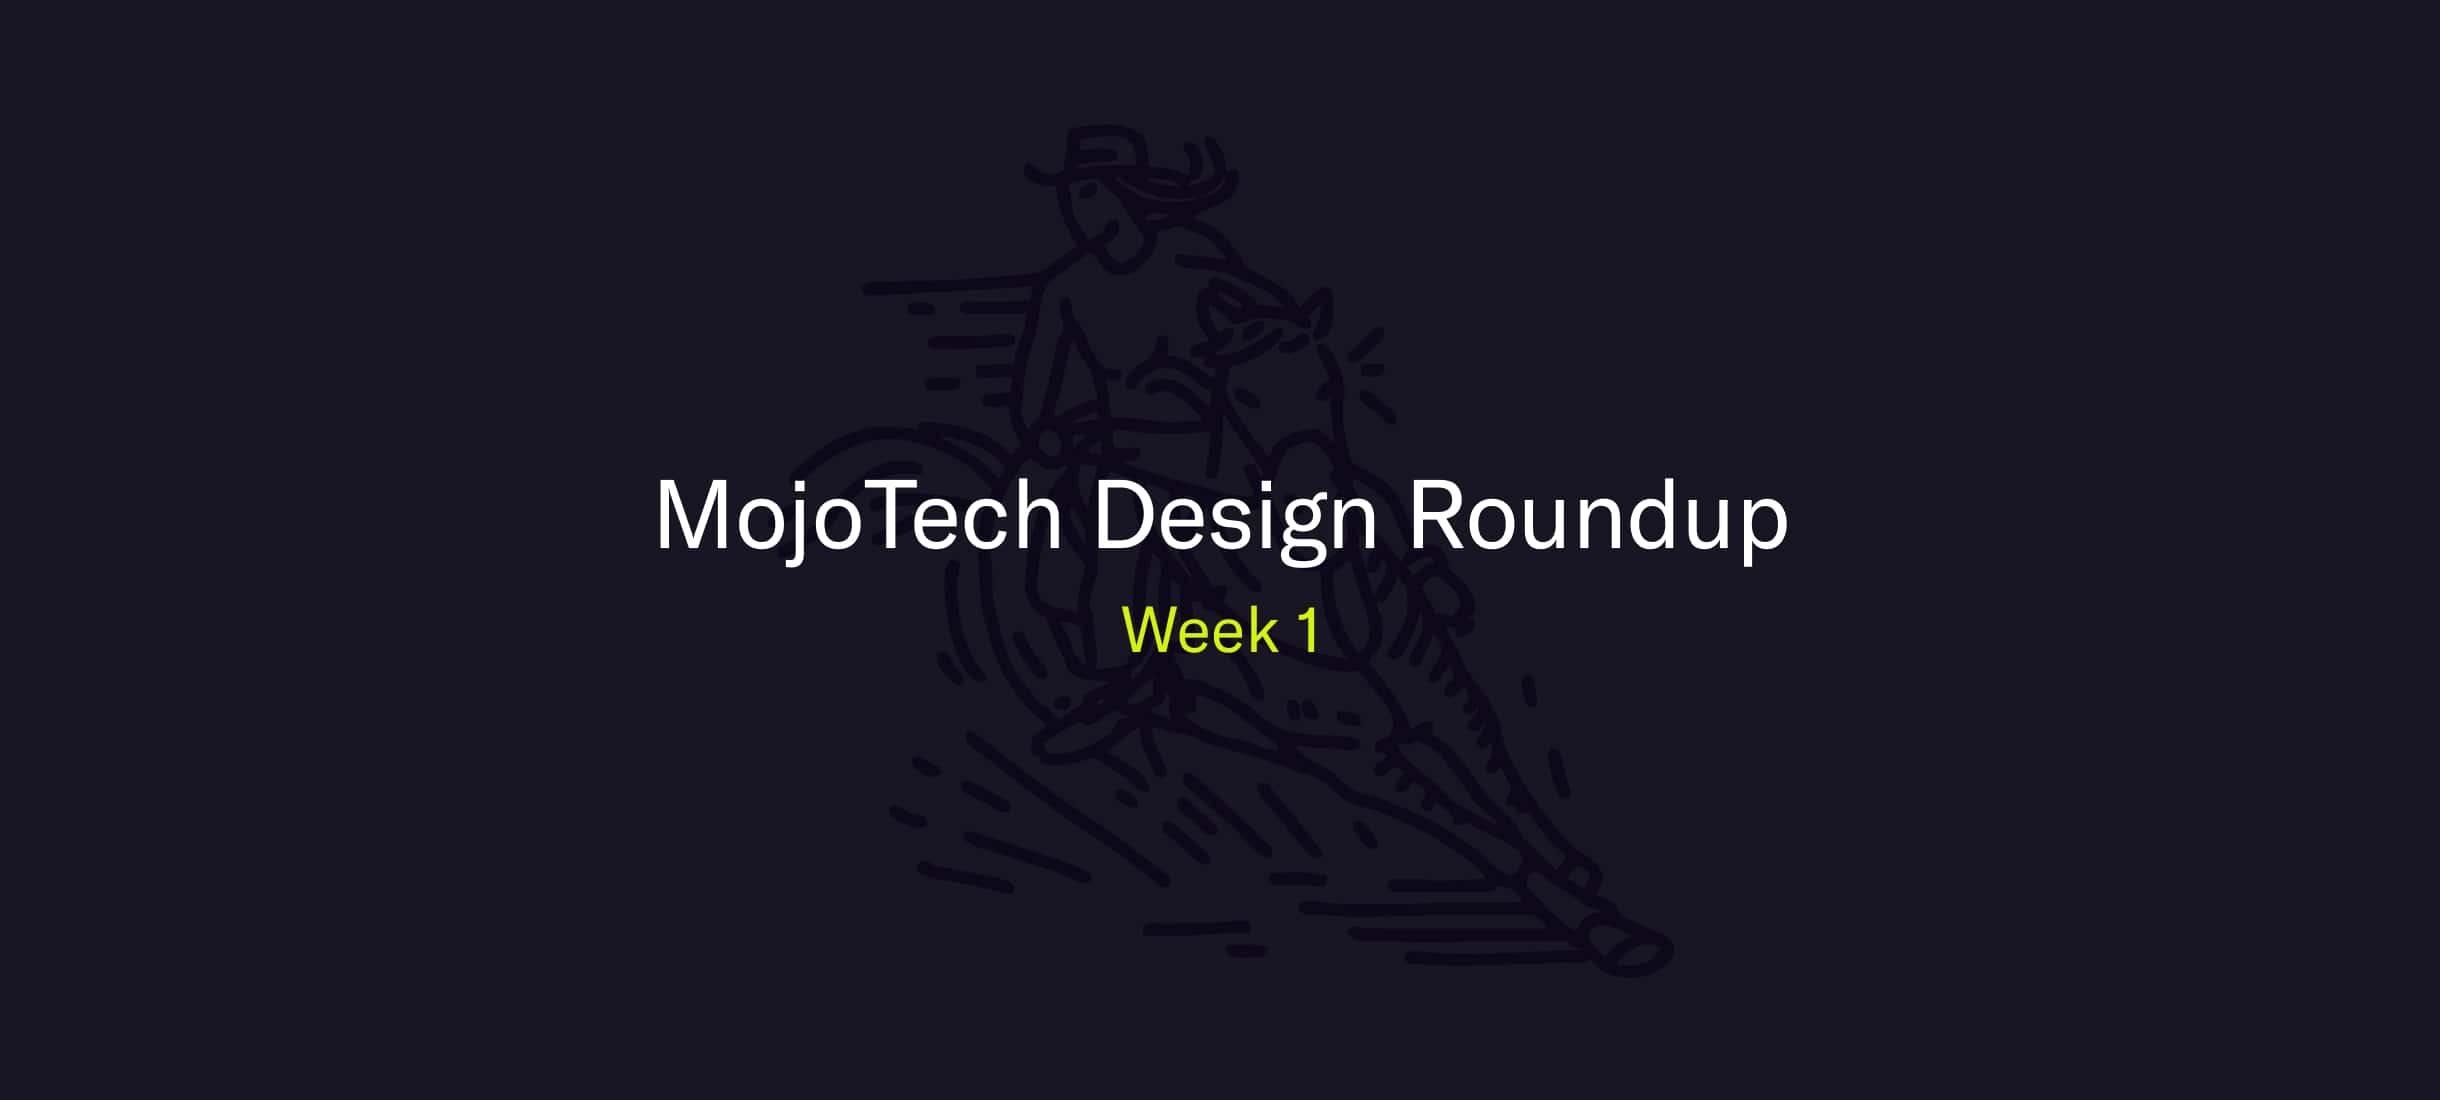 MojoTech Design Roundup